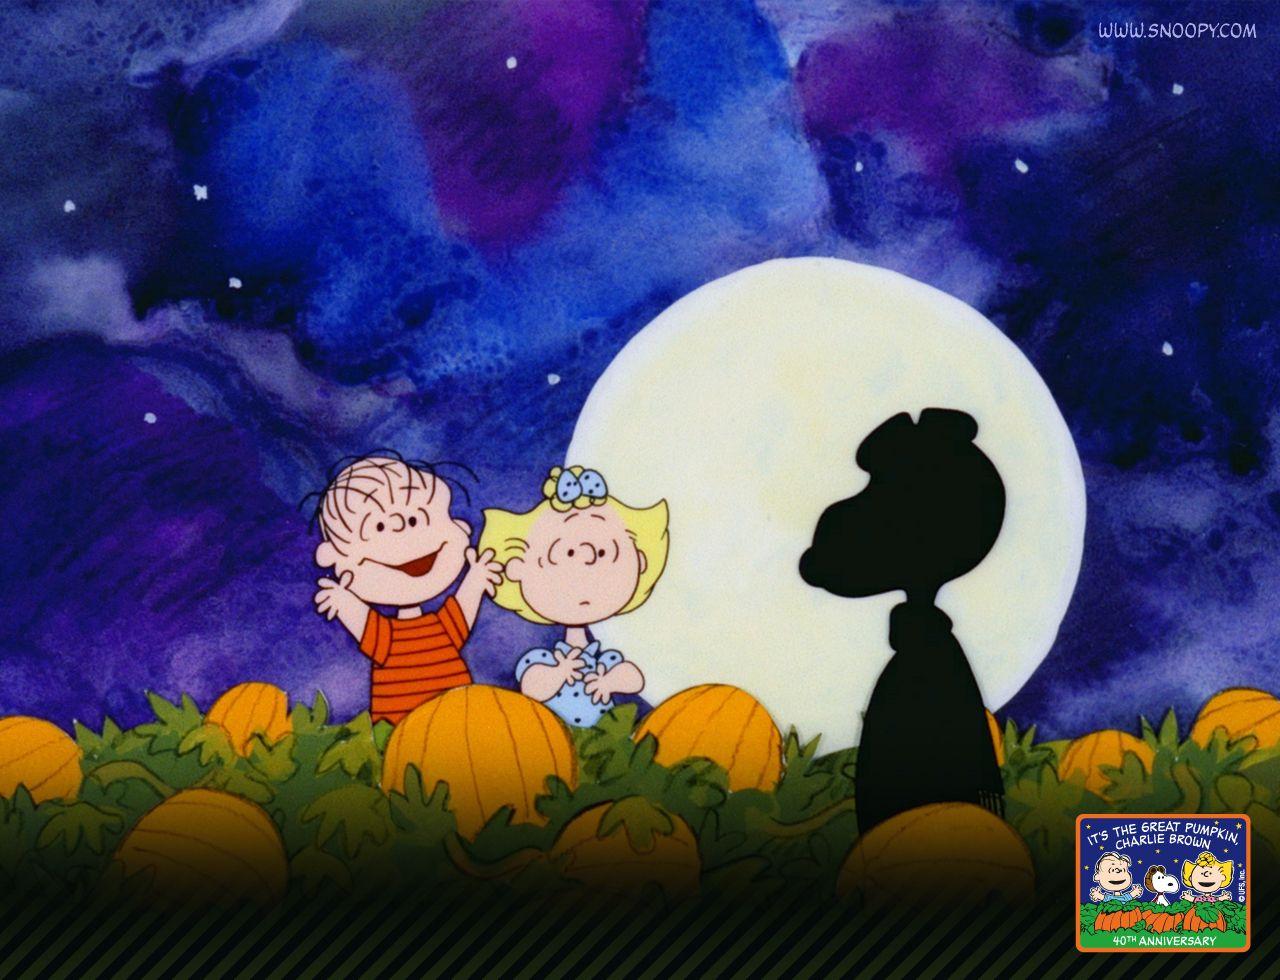 Peanuts Halloween Wallpaper | Snoopy Desktops / free Movie ...